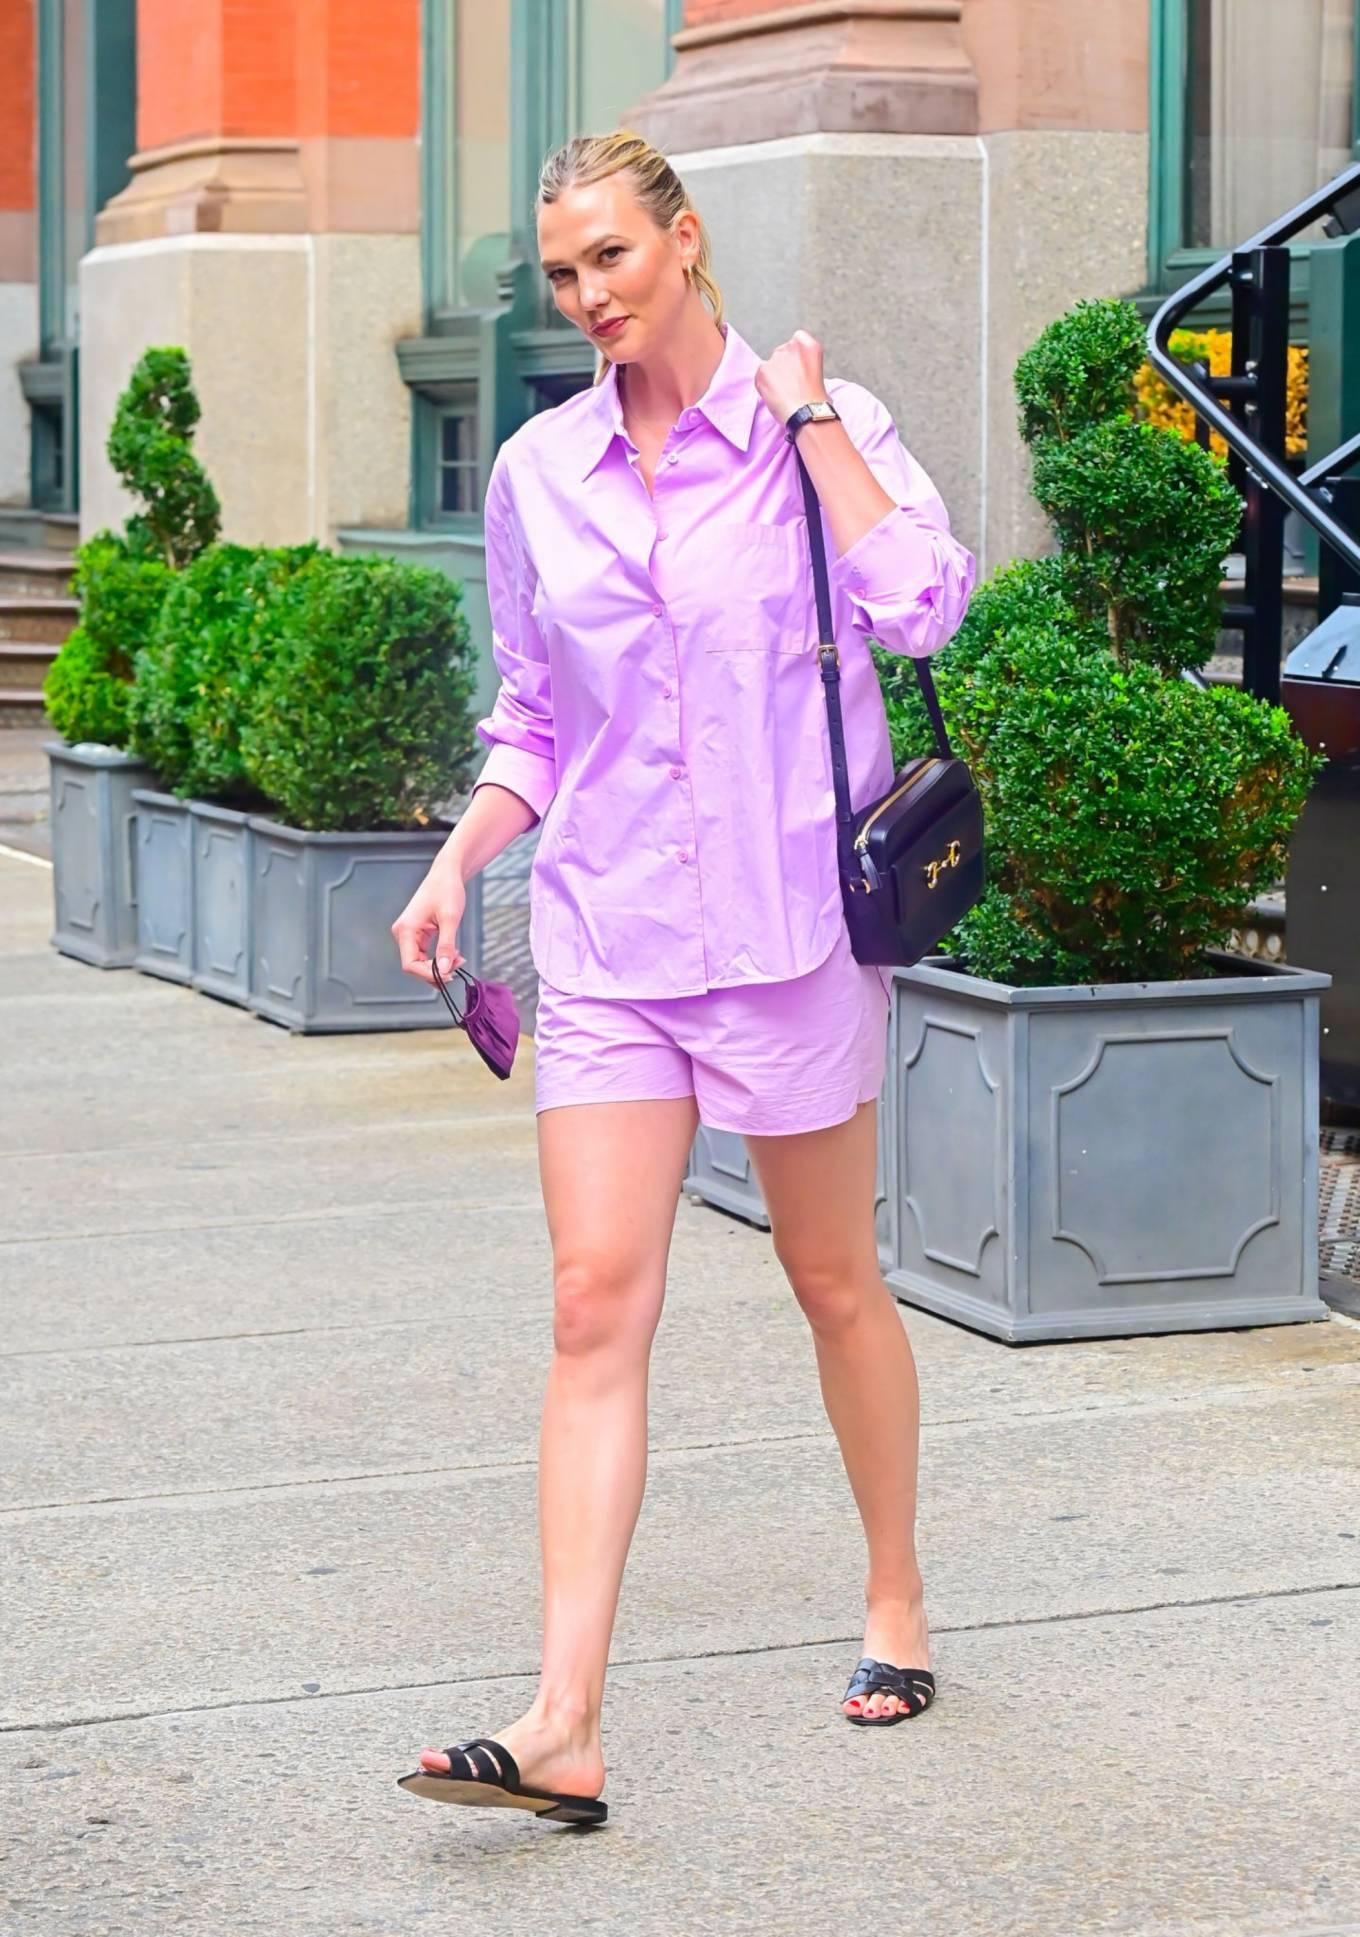 Karlie Kloss 2021 : Karlie Kloss – In lilac seen walking in SoHo in New York City-04